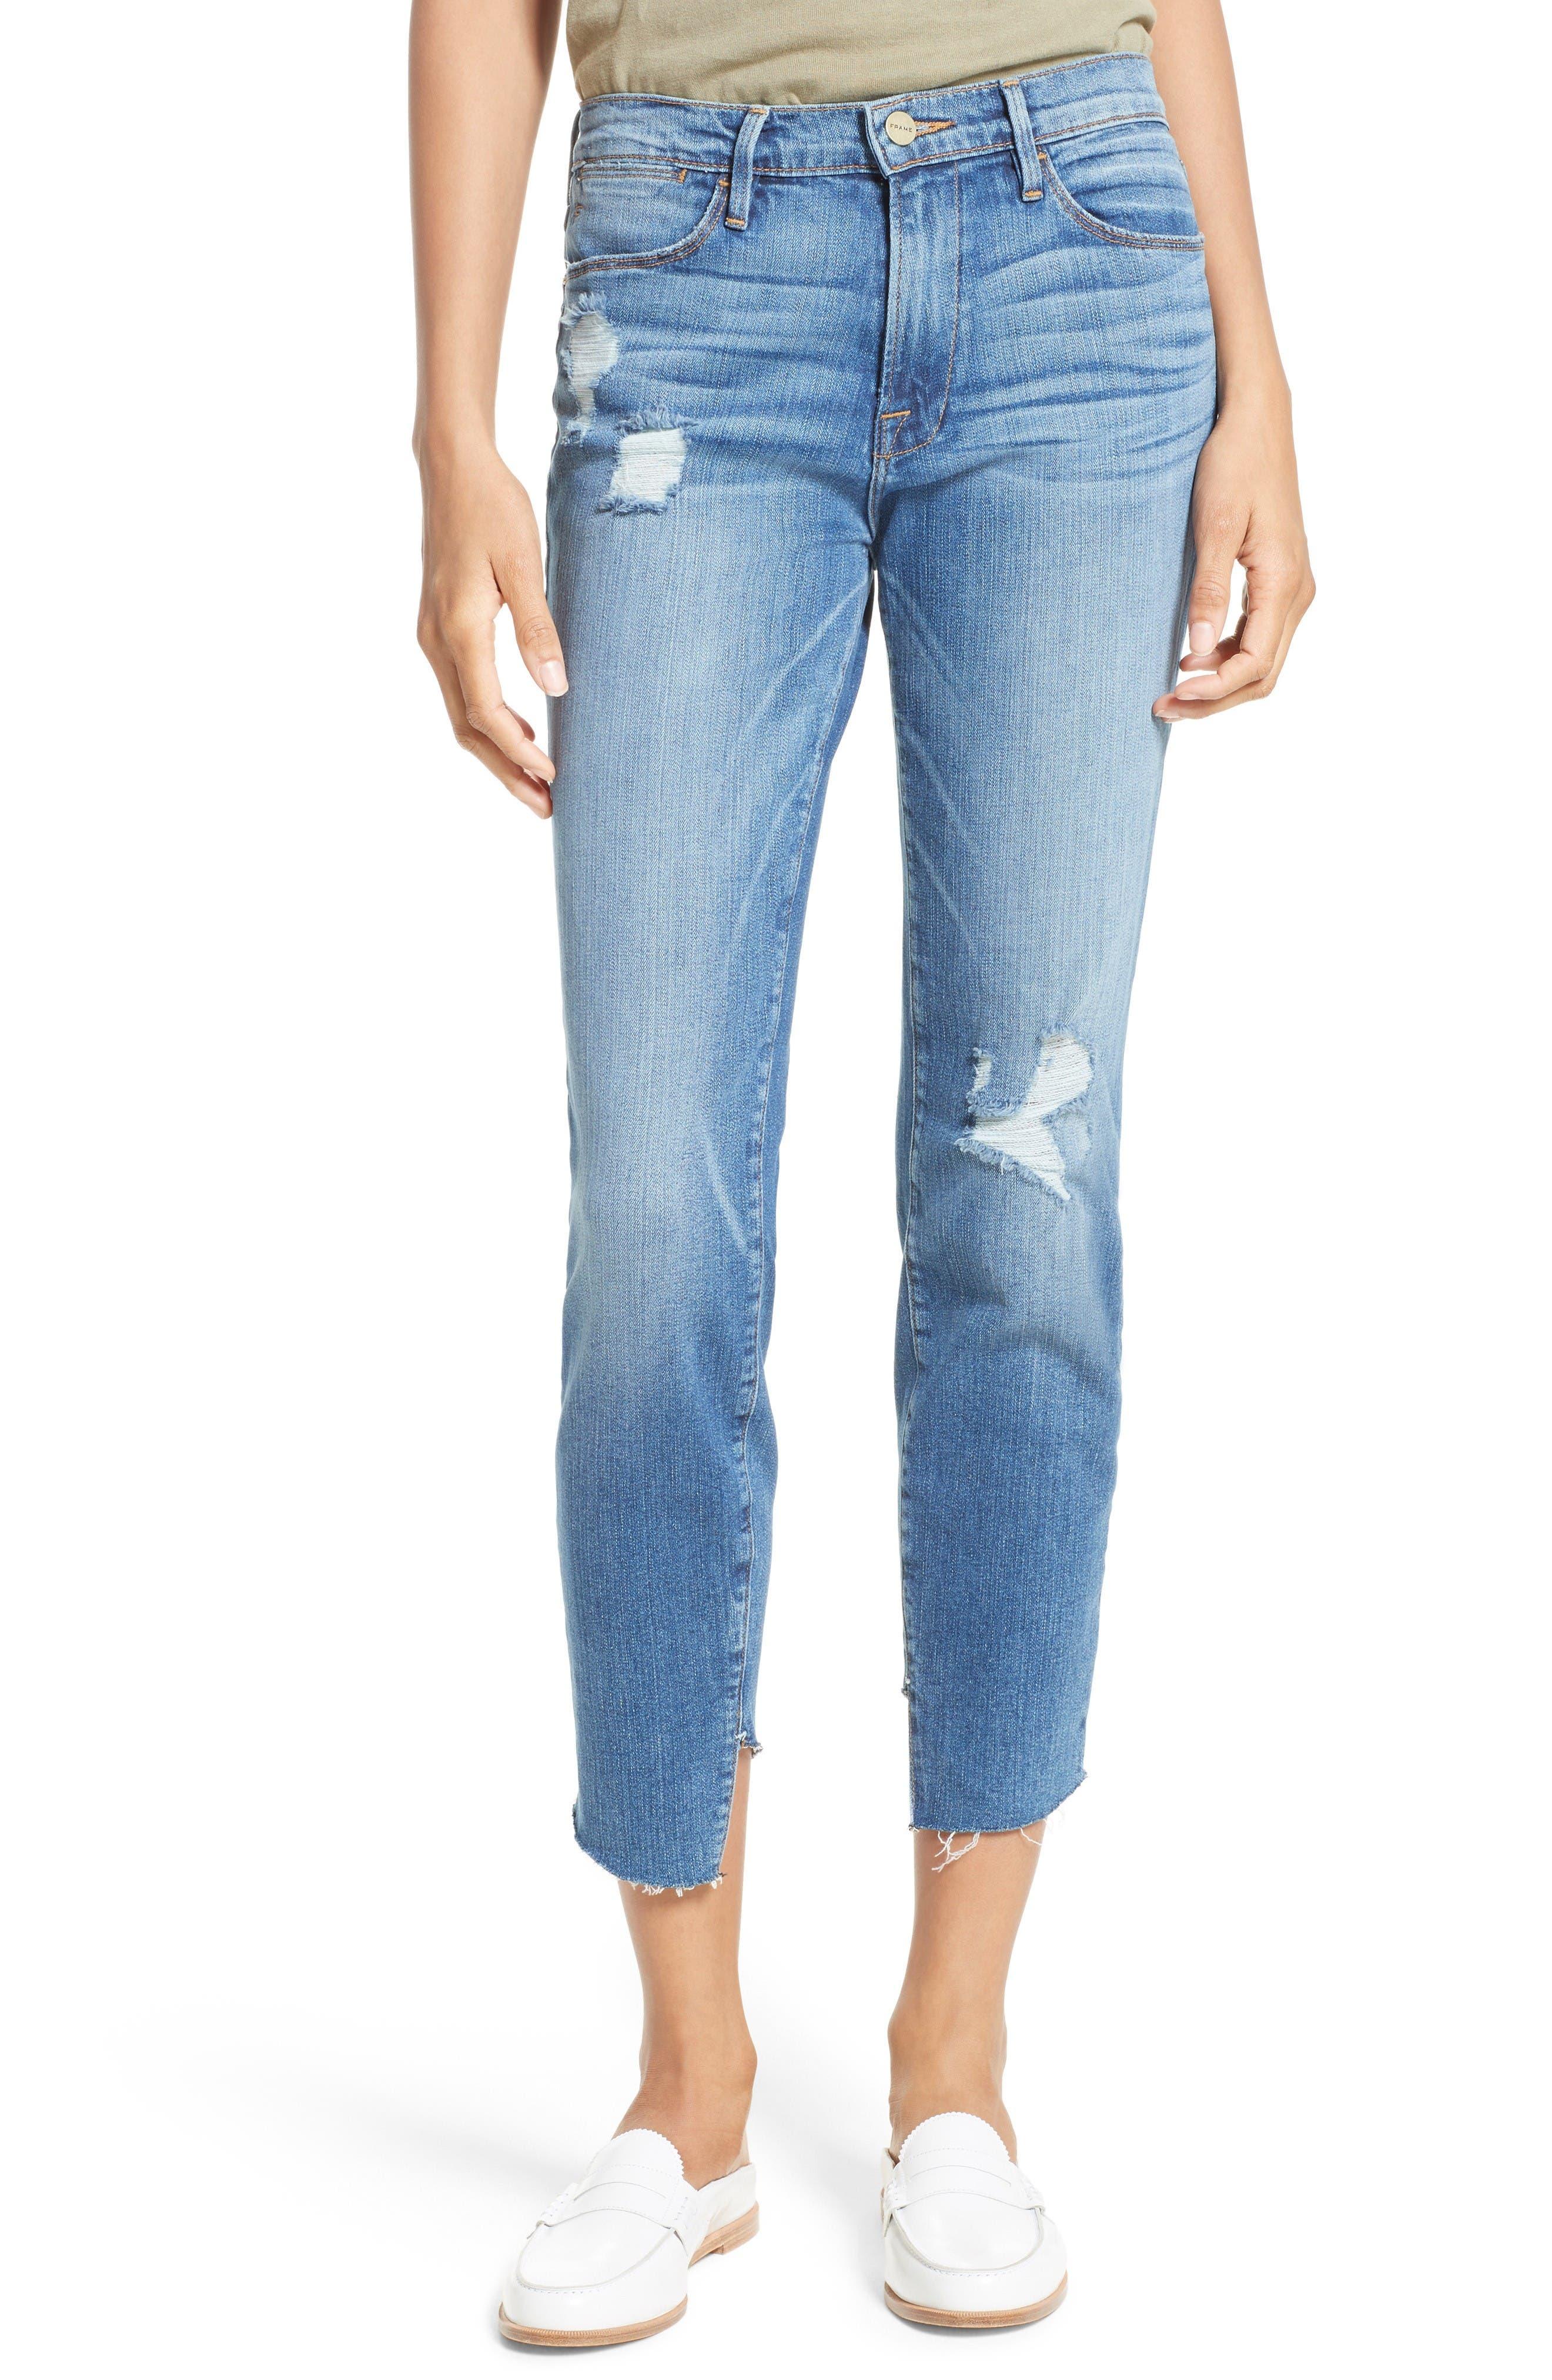 Alternate Image 1 Selected - FRAME Le High Skinny Cascade Hem Jeans (Arenas) (Nordstrom Exclusive)